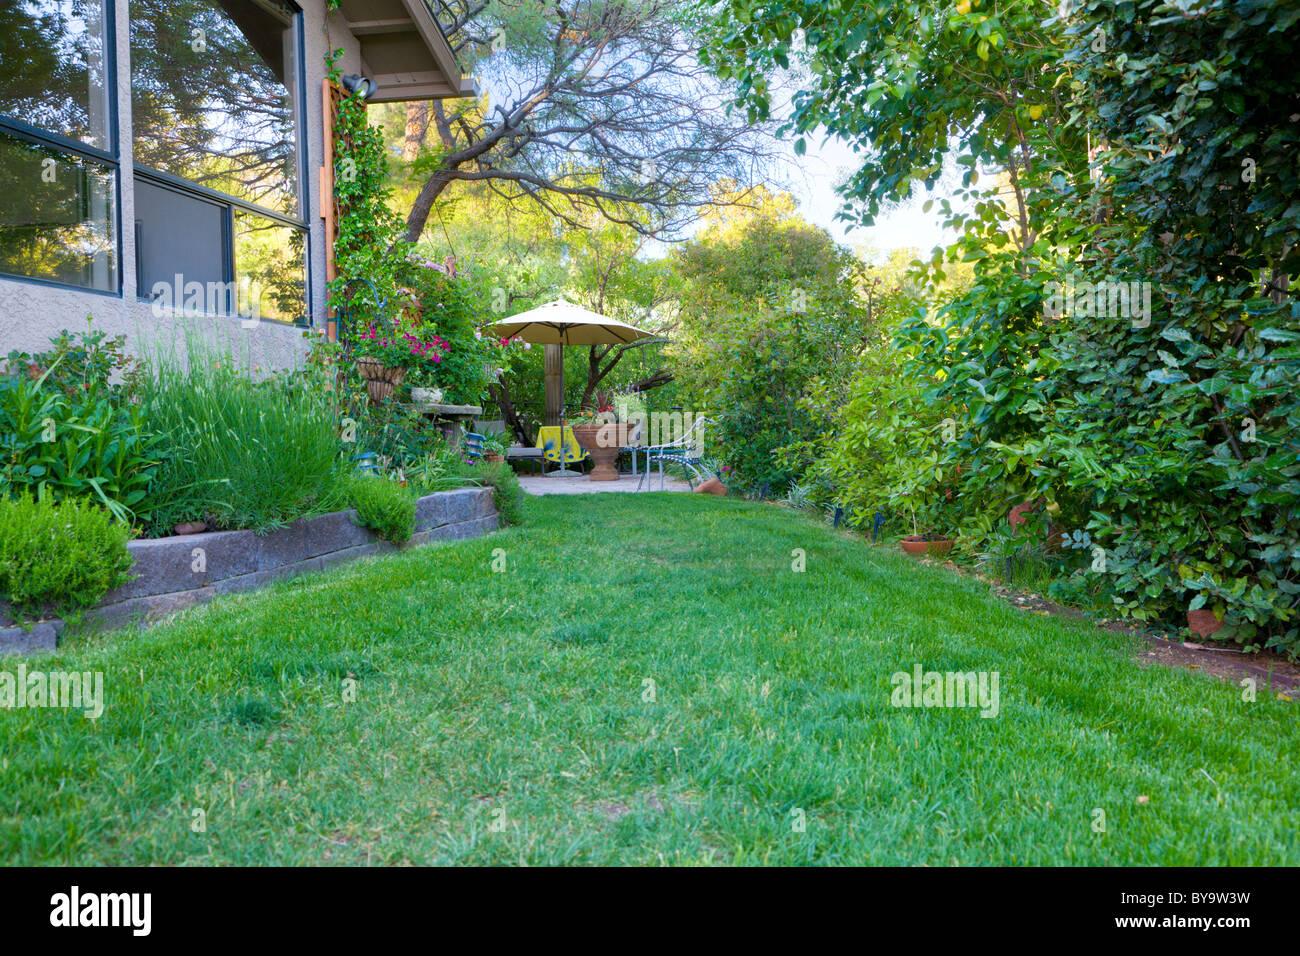 Garden and patio - Stock Image